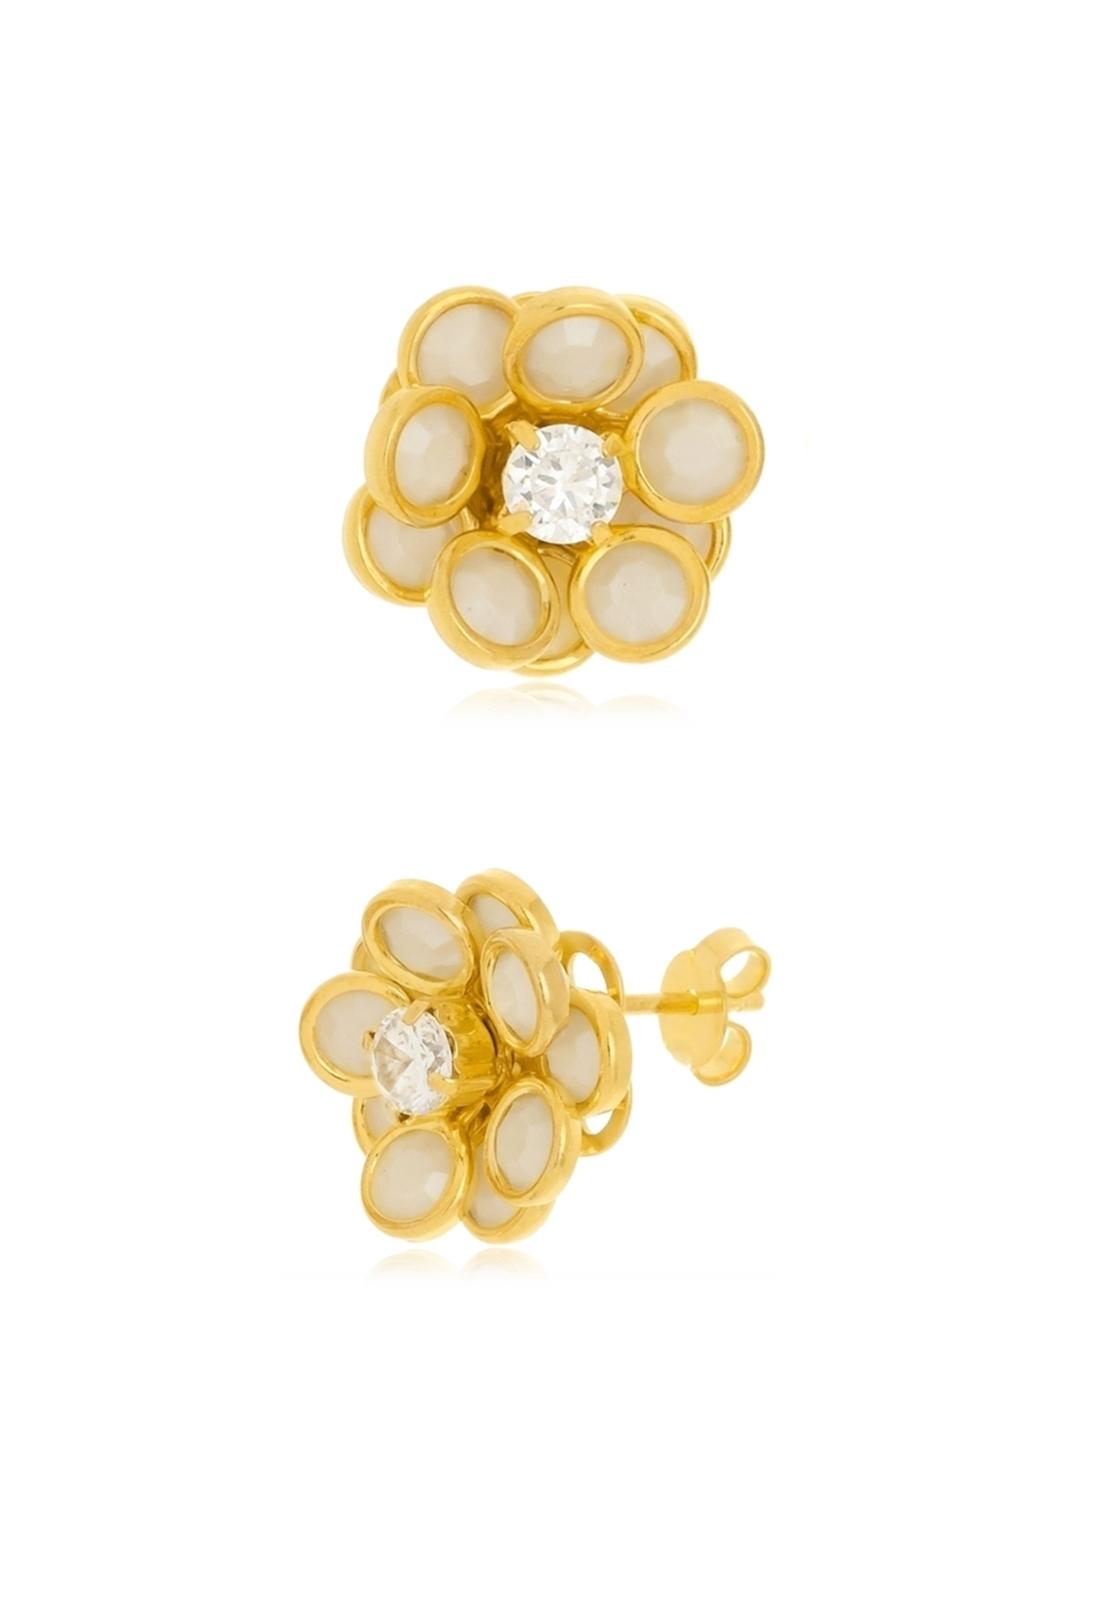 Brinco Le Diamond Flor Madrepérola Dourado